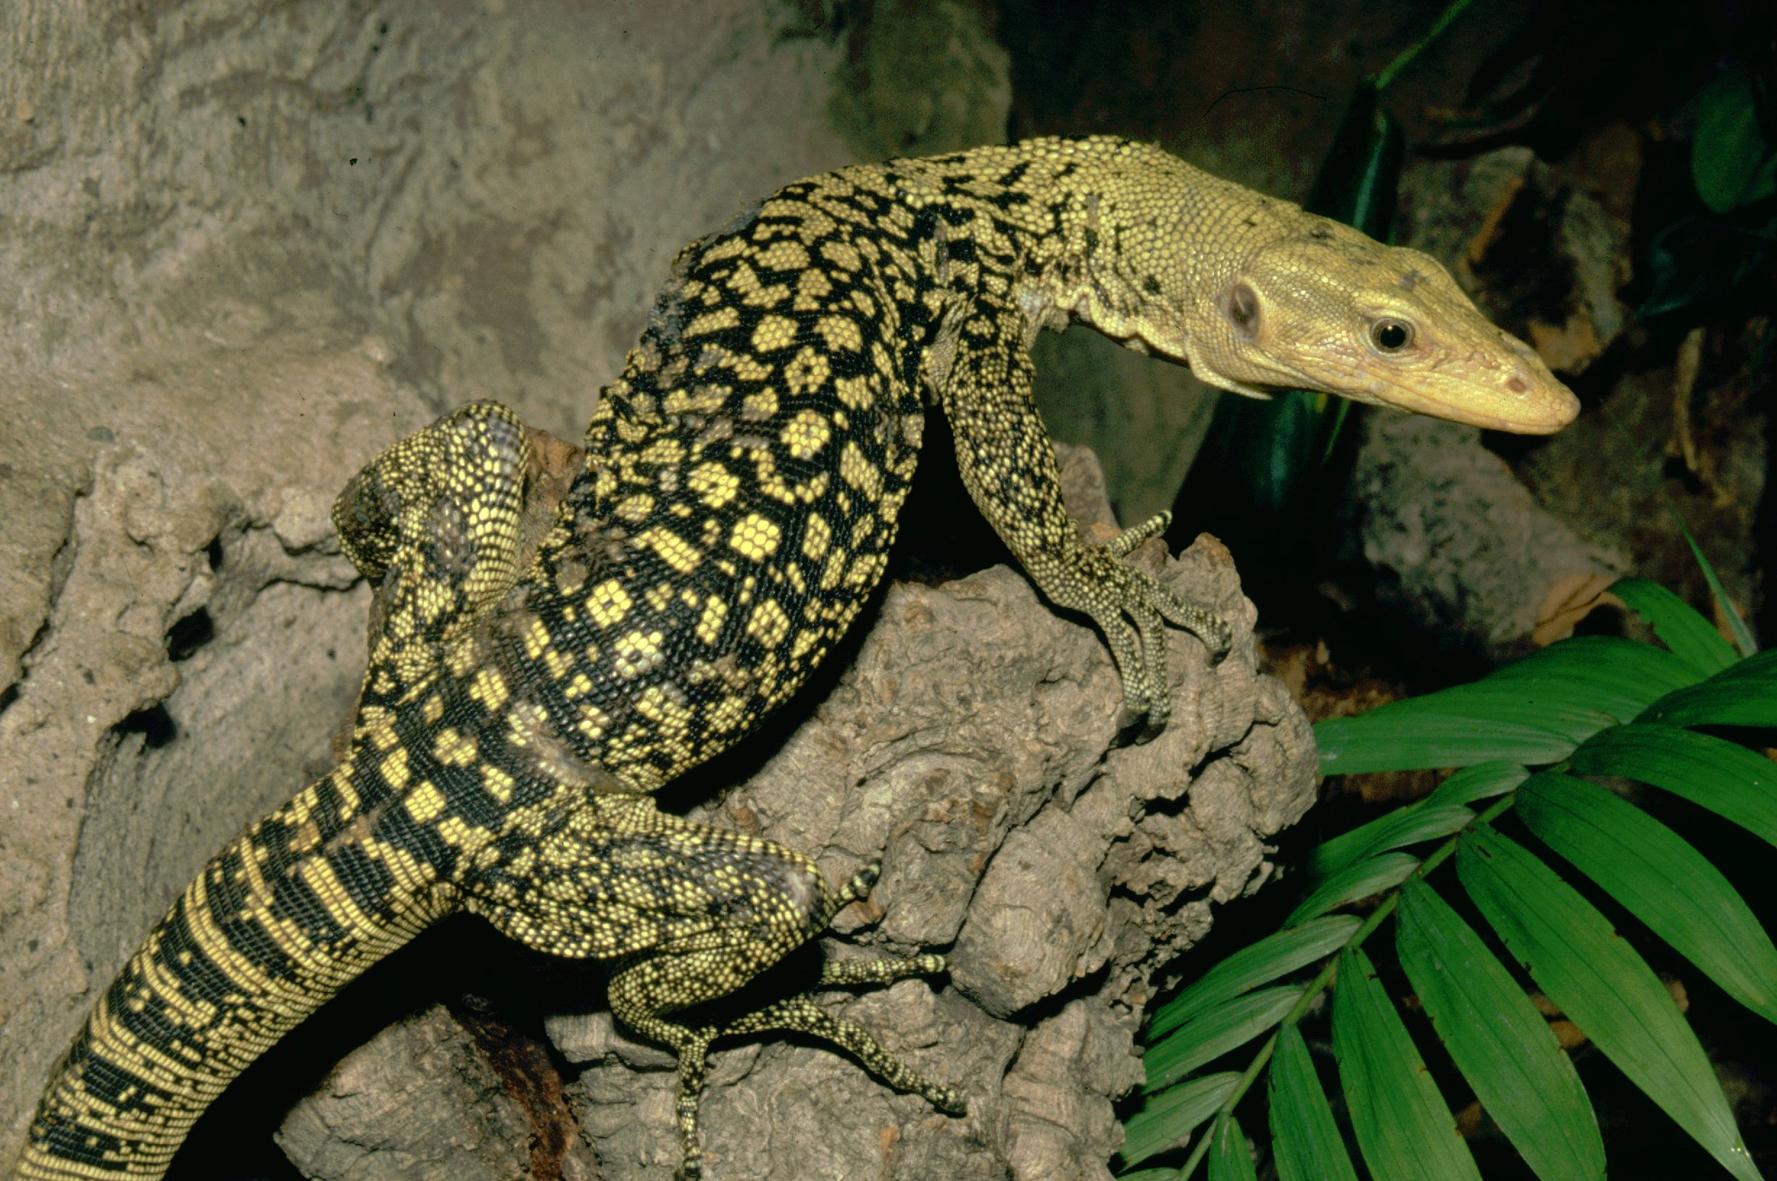 The relentless exploitation of Asian Giant Lizards